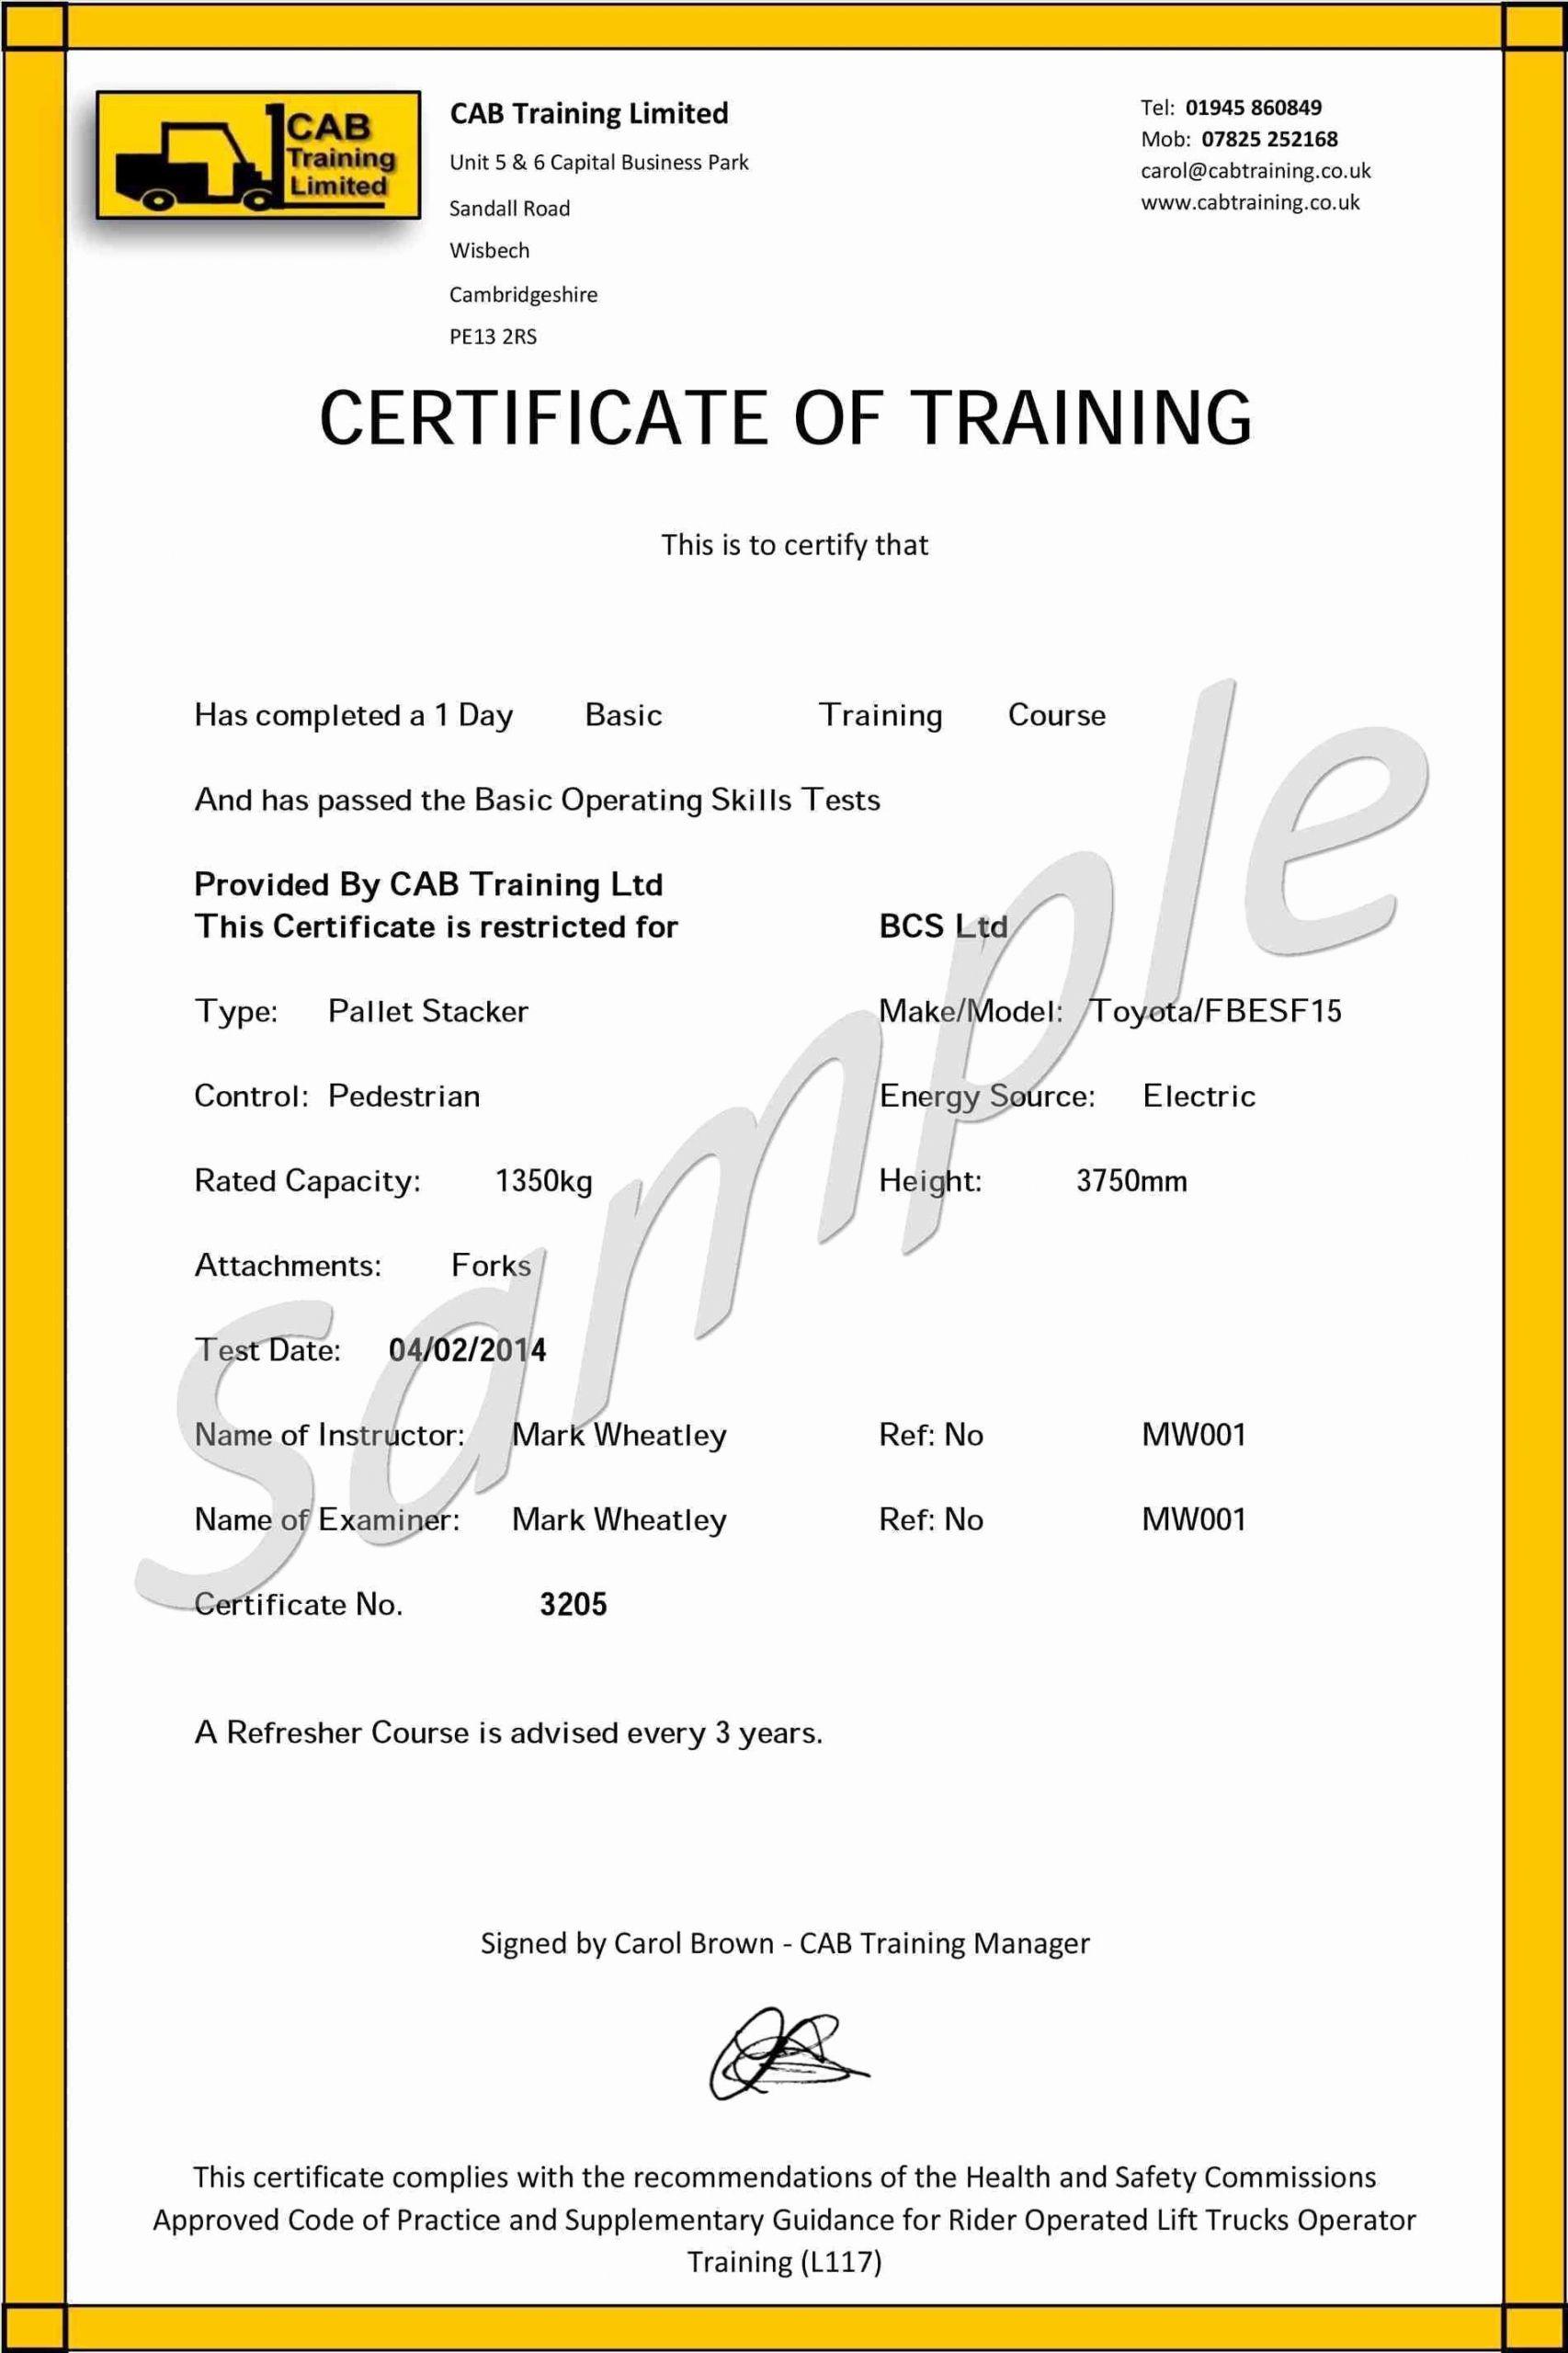 Forklift Certificate Template Free Elegant forklift Certificate Template Free